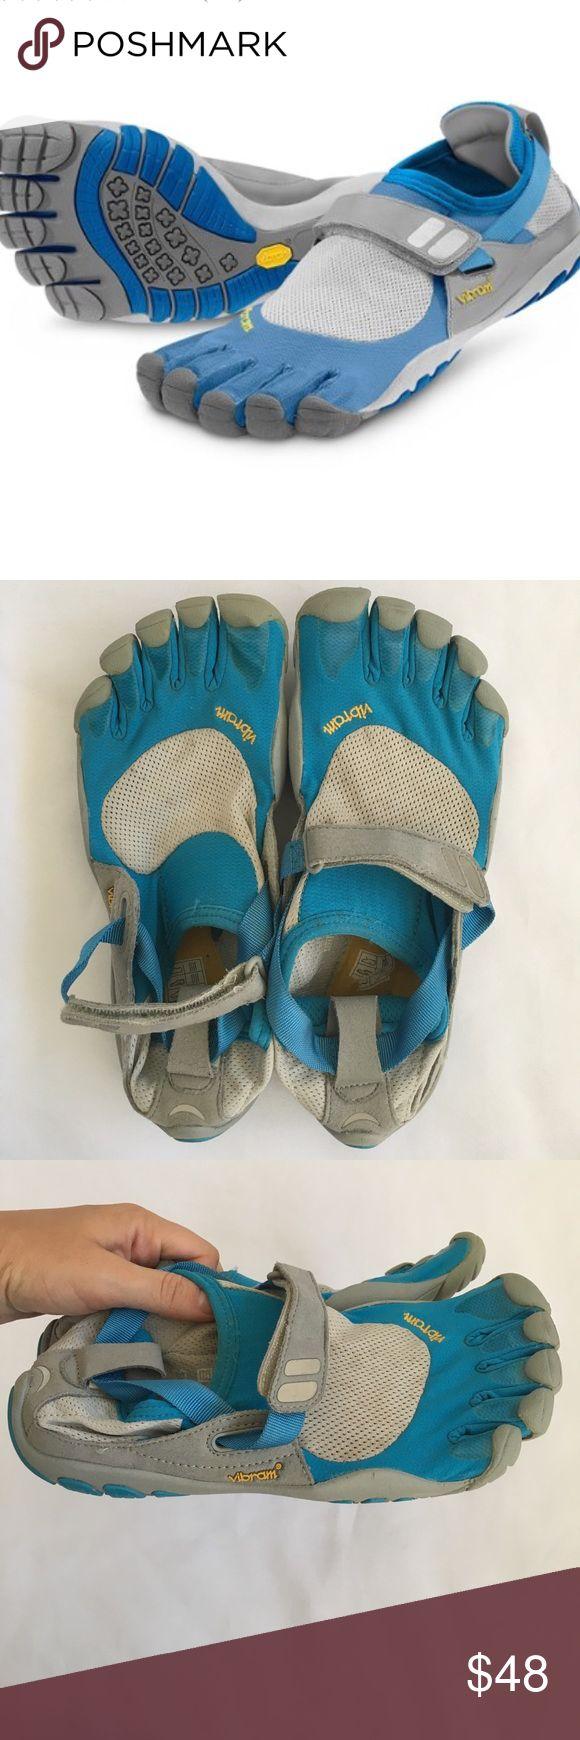 Vibram Five Fingers Toe Shoes sz 39 7.5 / 8 Excellent like new condition Vibram Five Fingers Performance Shoes Velcro Reglective Straps with Silver & Blue Mesh Ladies Size 39 Nike Shoes Athletic Shoes